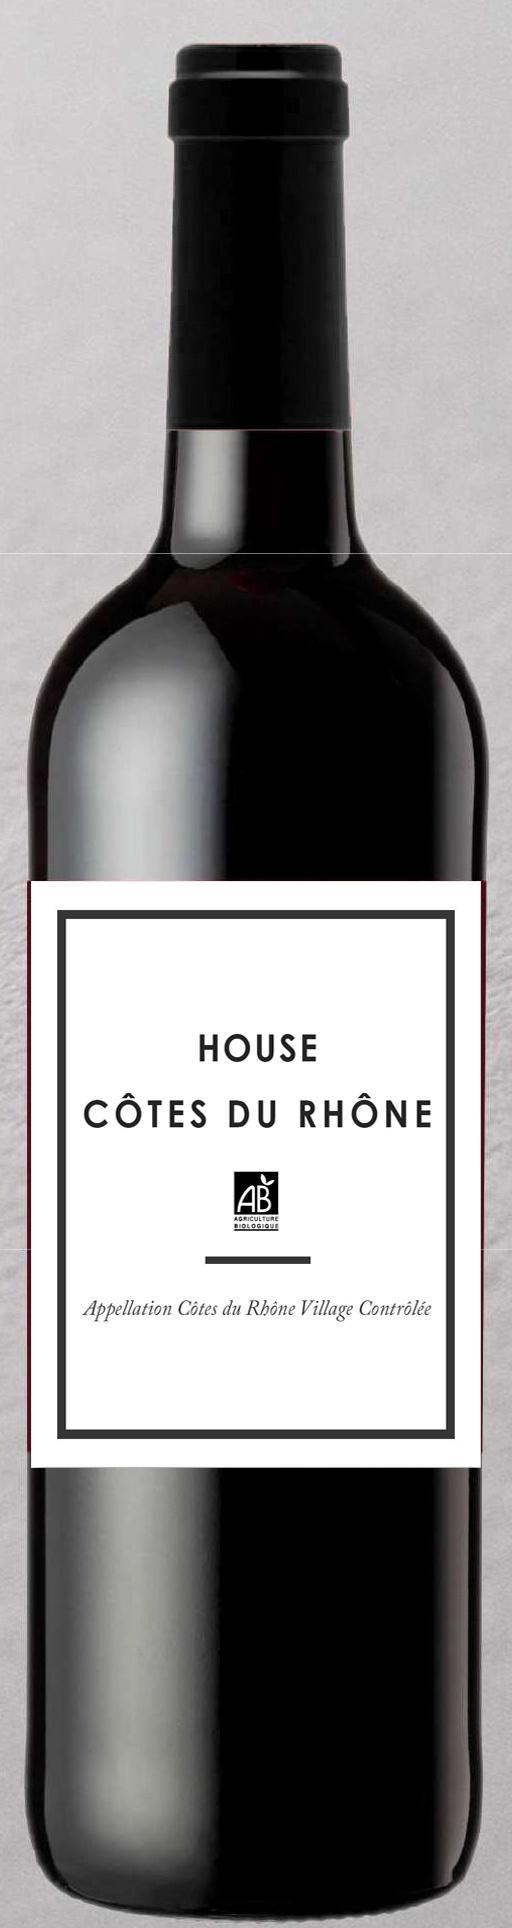 "SOHO ""House"" Cotes Du Rhone"